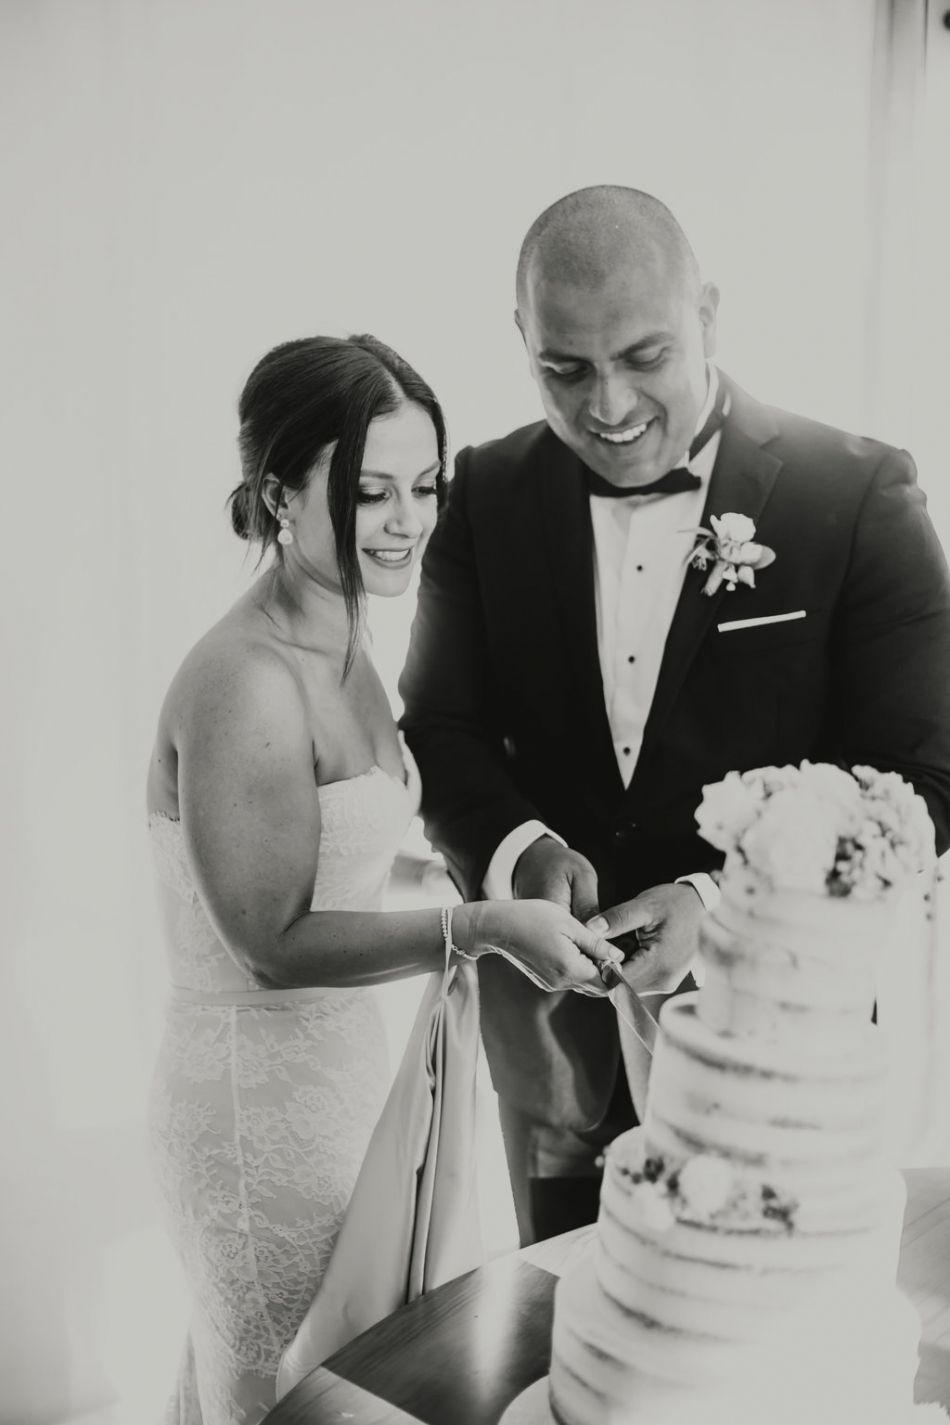 Sophia One Day Bridal Stella Wedding Gown Photography I Got You